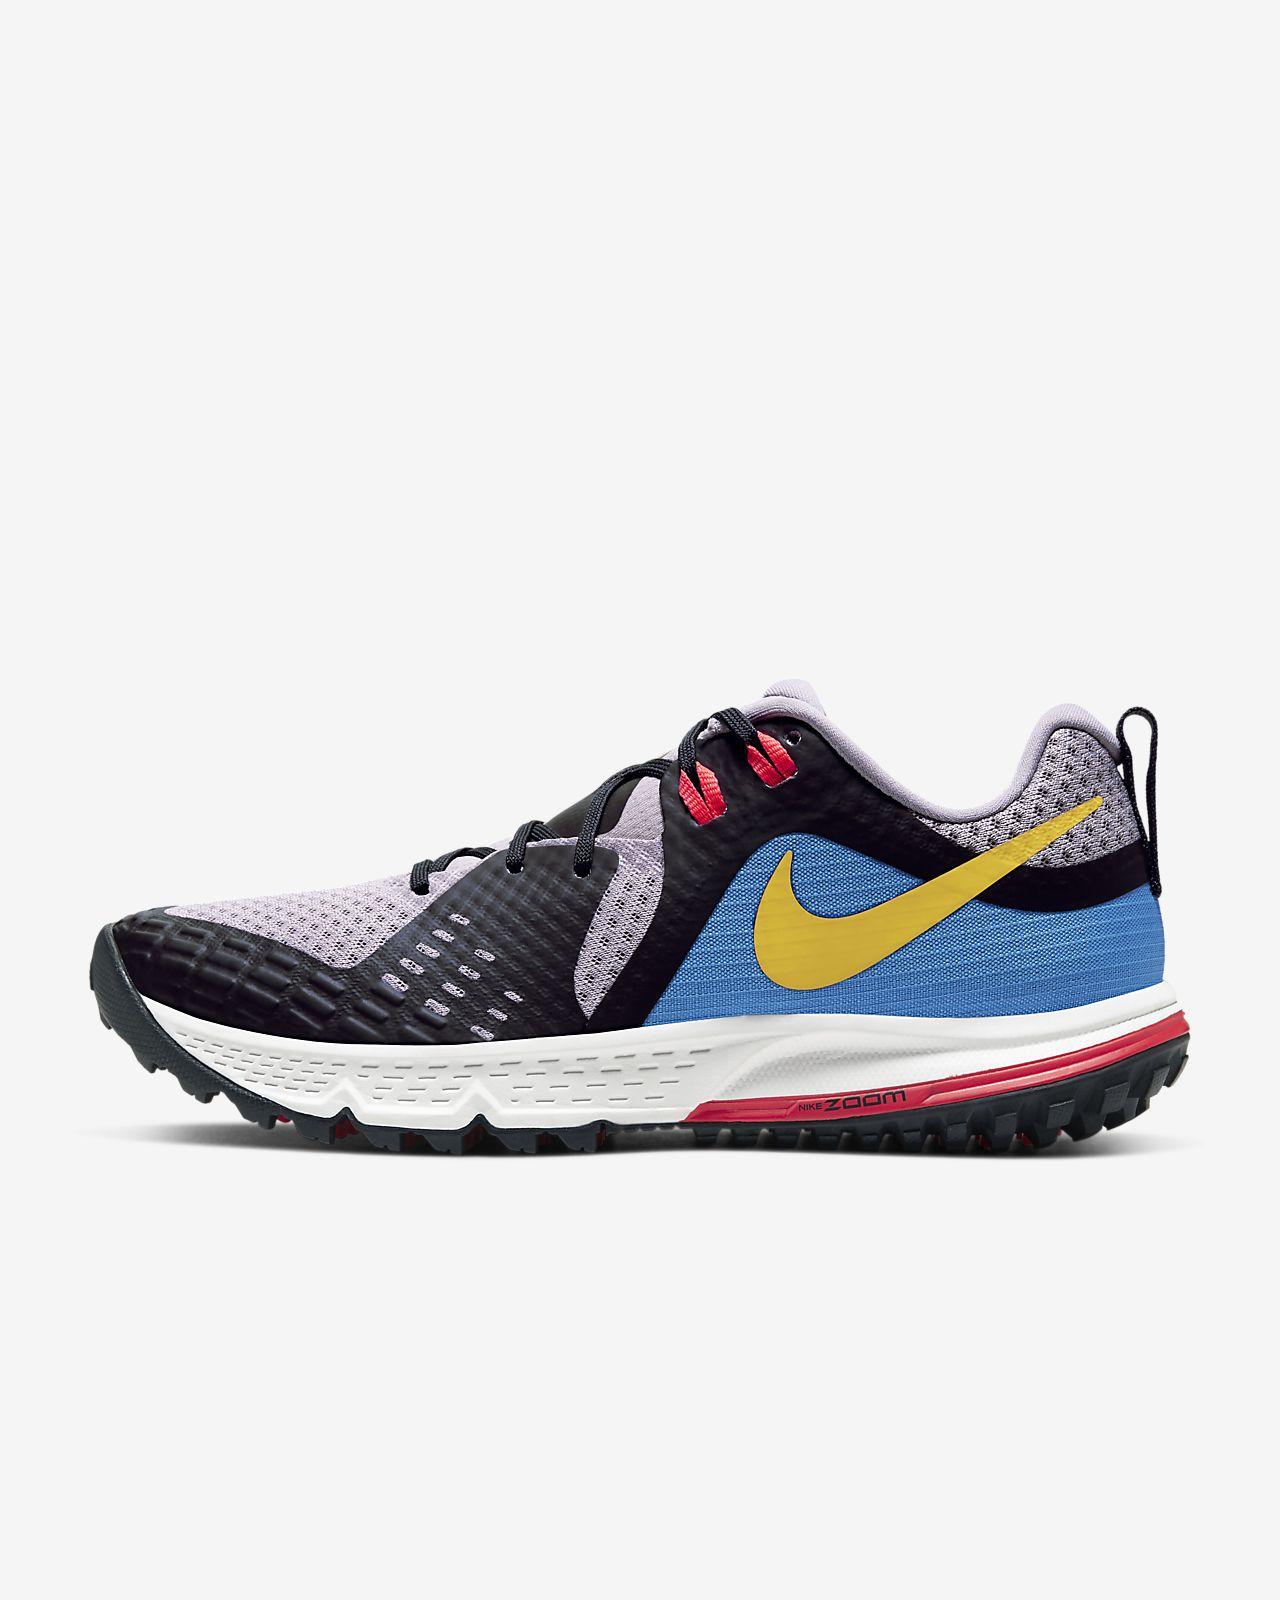 Nike Air Zoom Wildhorse 5 Women's Trail Running Shoe